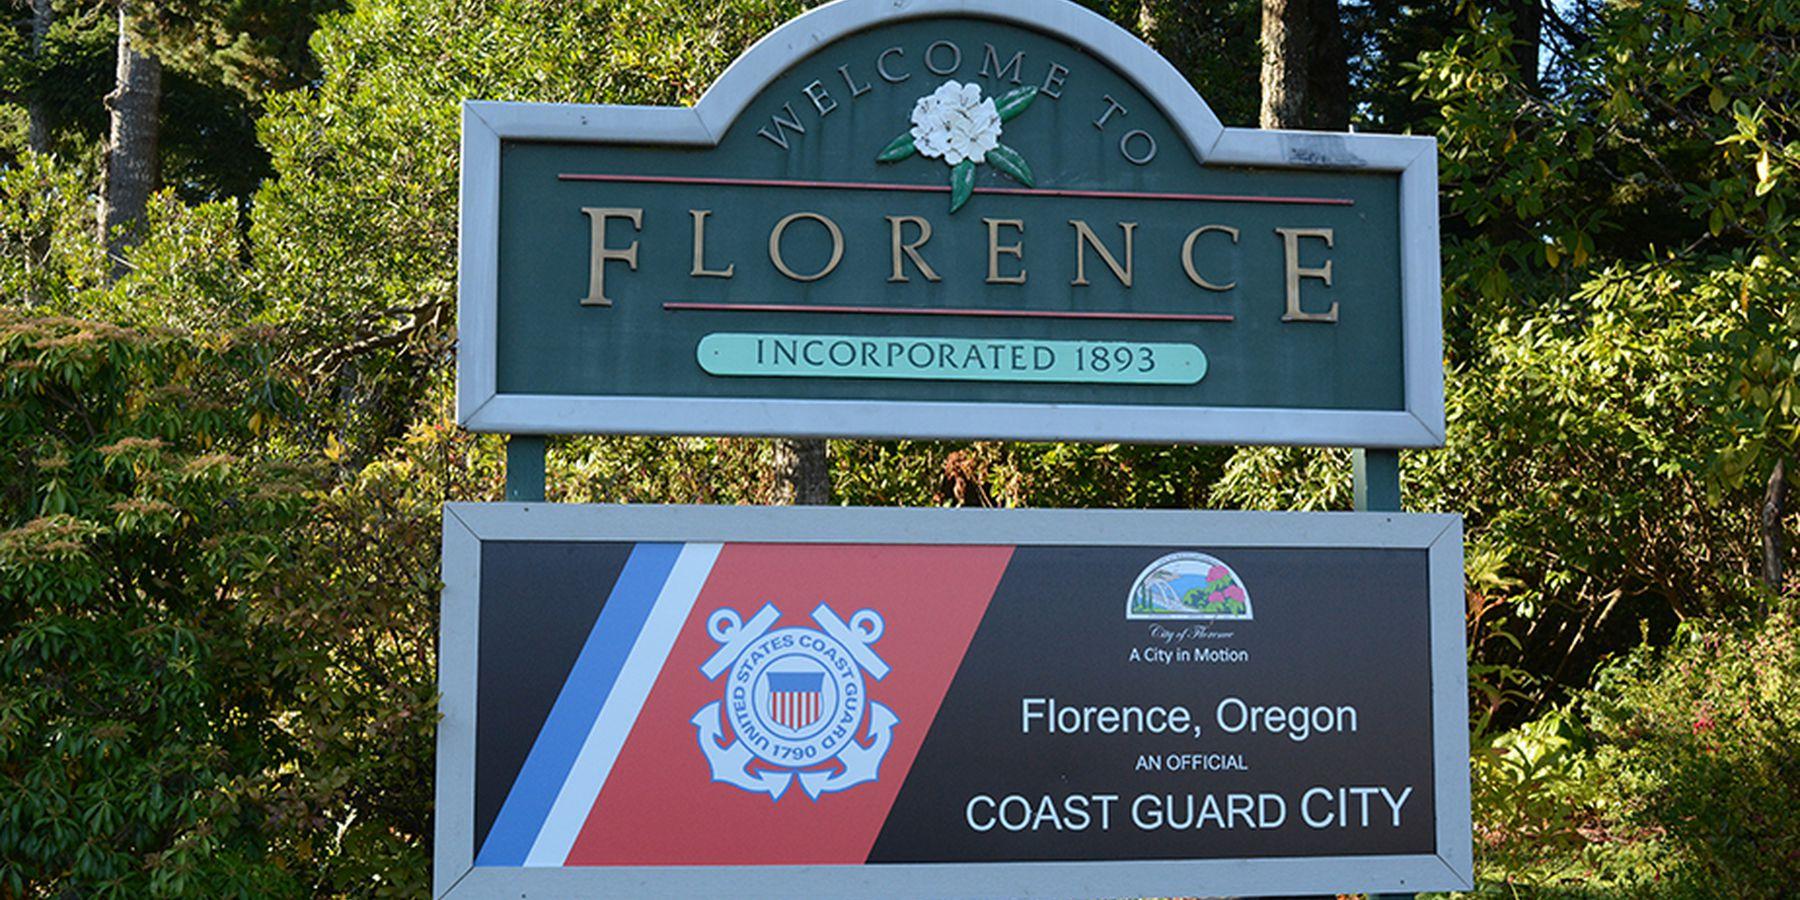 Florence - Astoria - Oregon - Doets Reizen